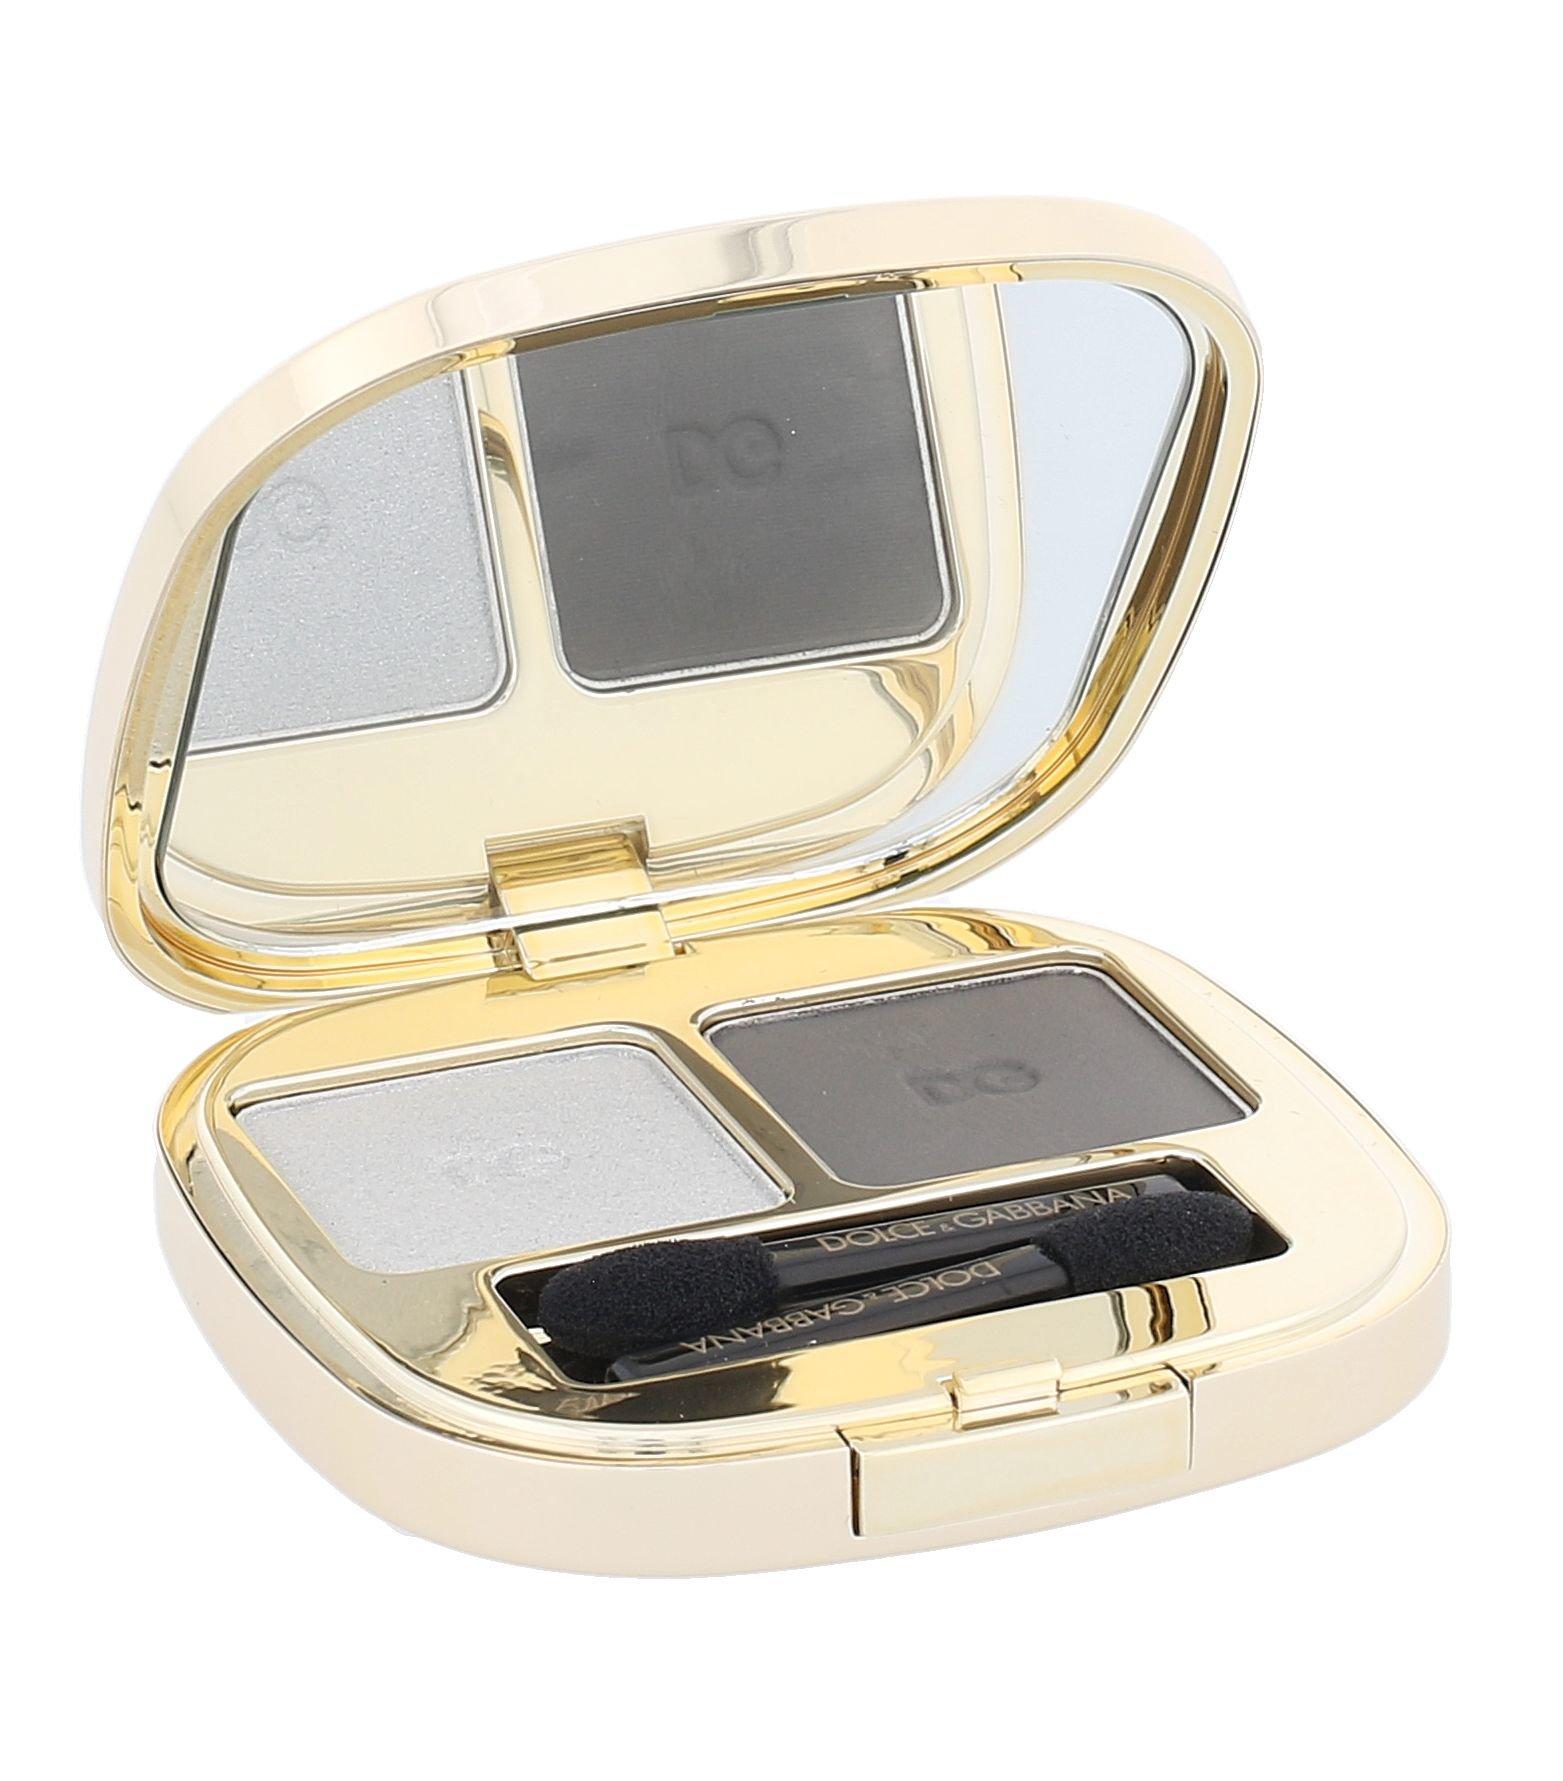 Dolce&Gabbana The Eyeshadow Cosmetic 5ml 120 Romance Duo